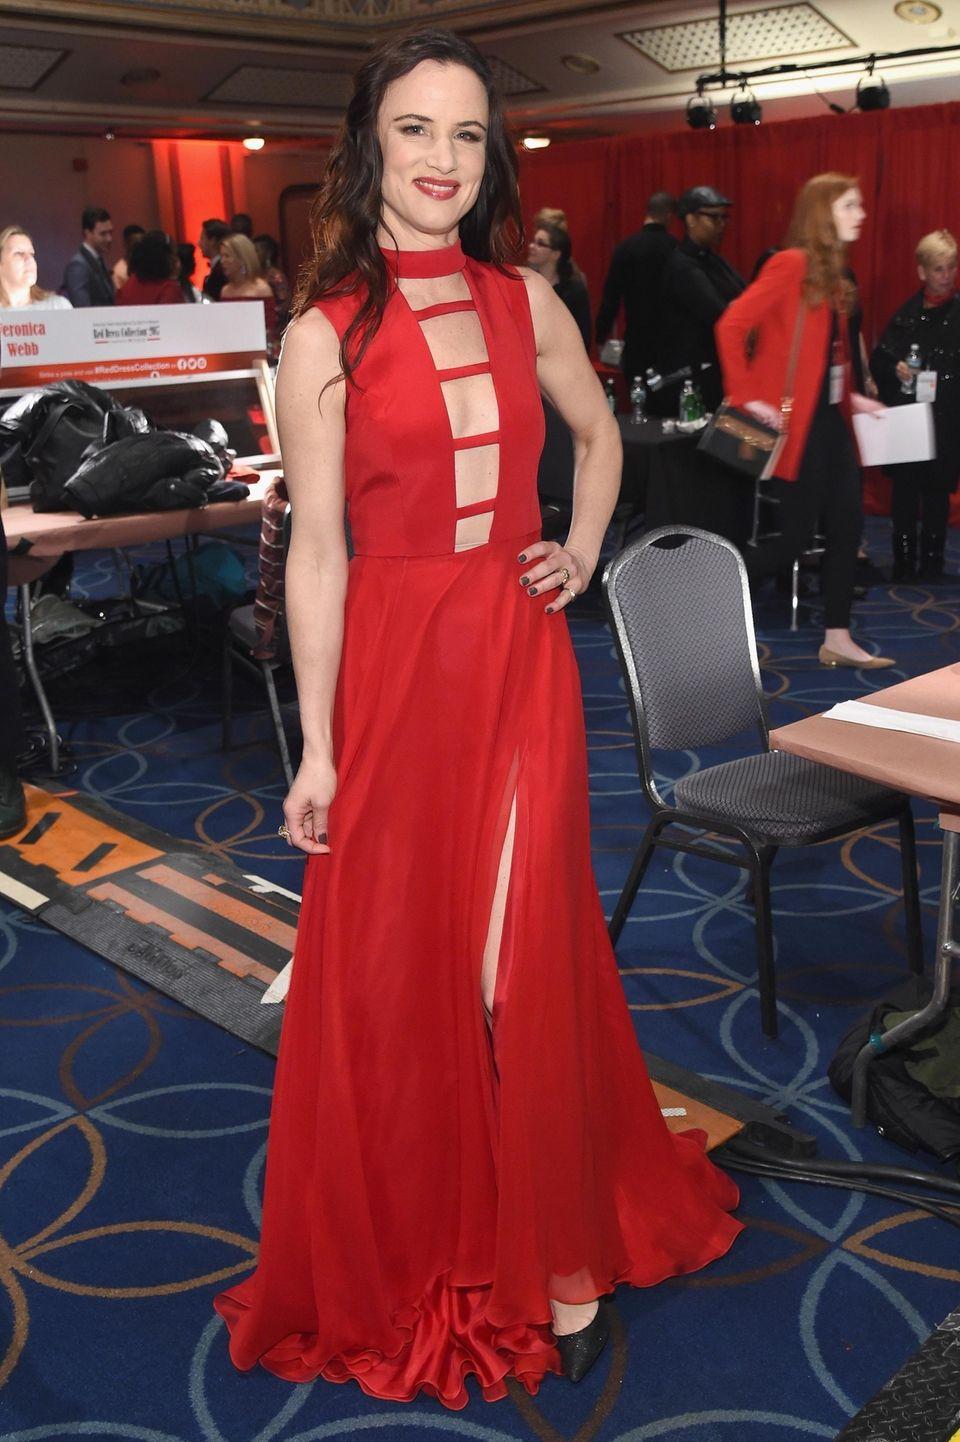 Juliette Lewis attends the American Heart Association show